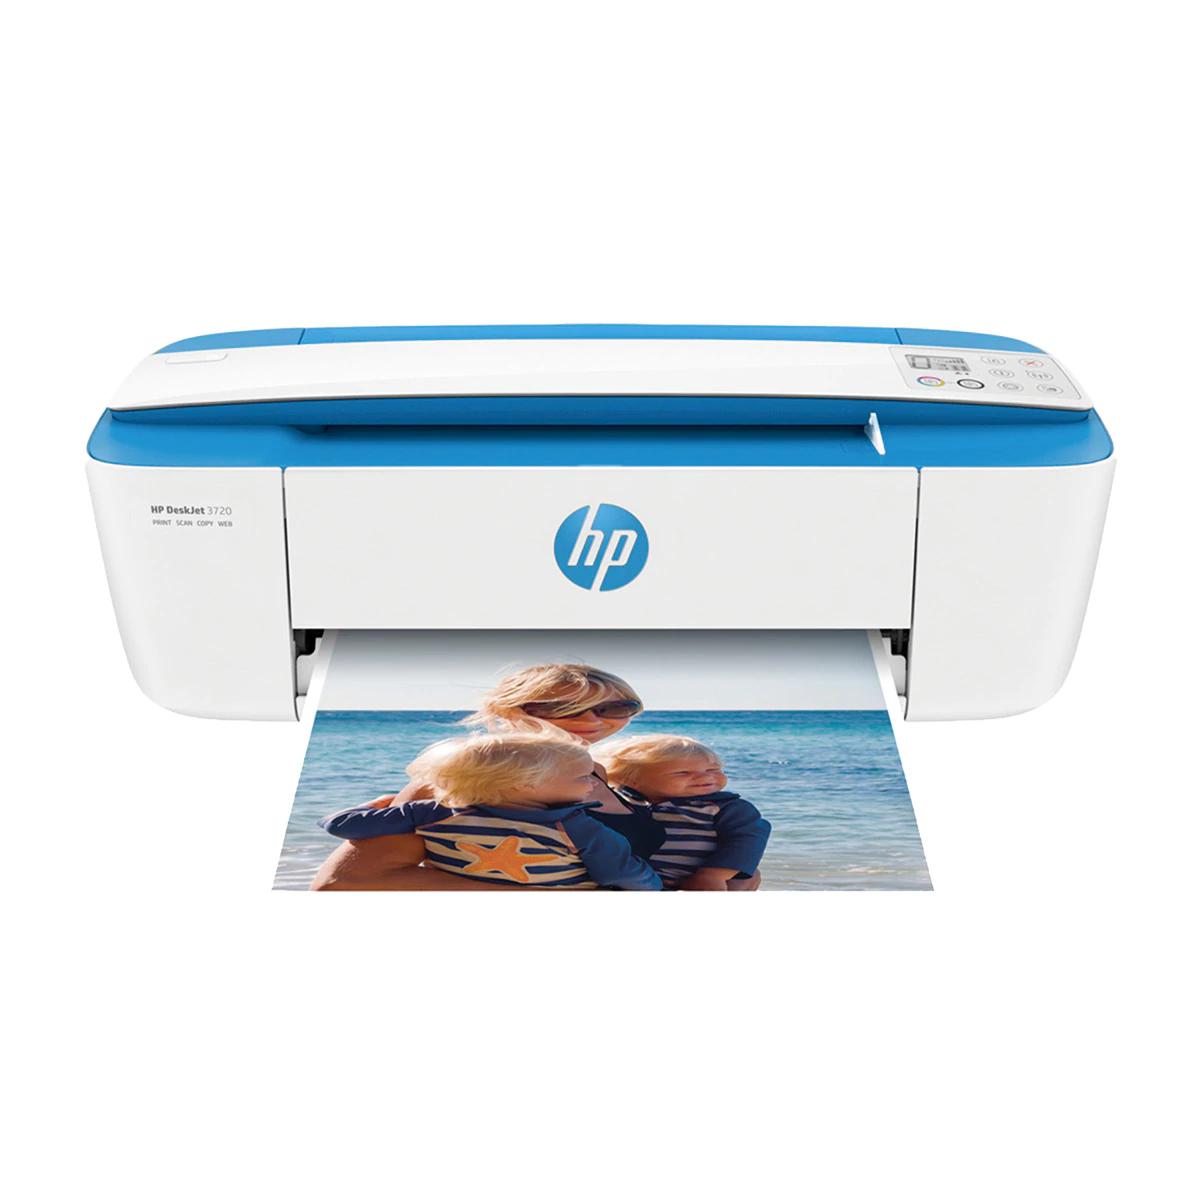 Impresora Multifunción Tinta HP DeskJet 3720 WiFi, Instant Ink